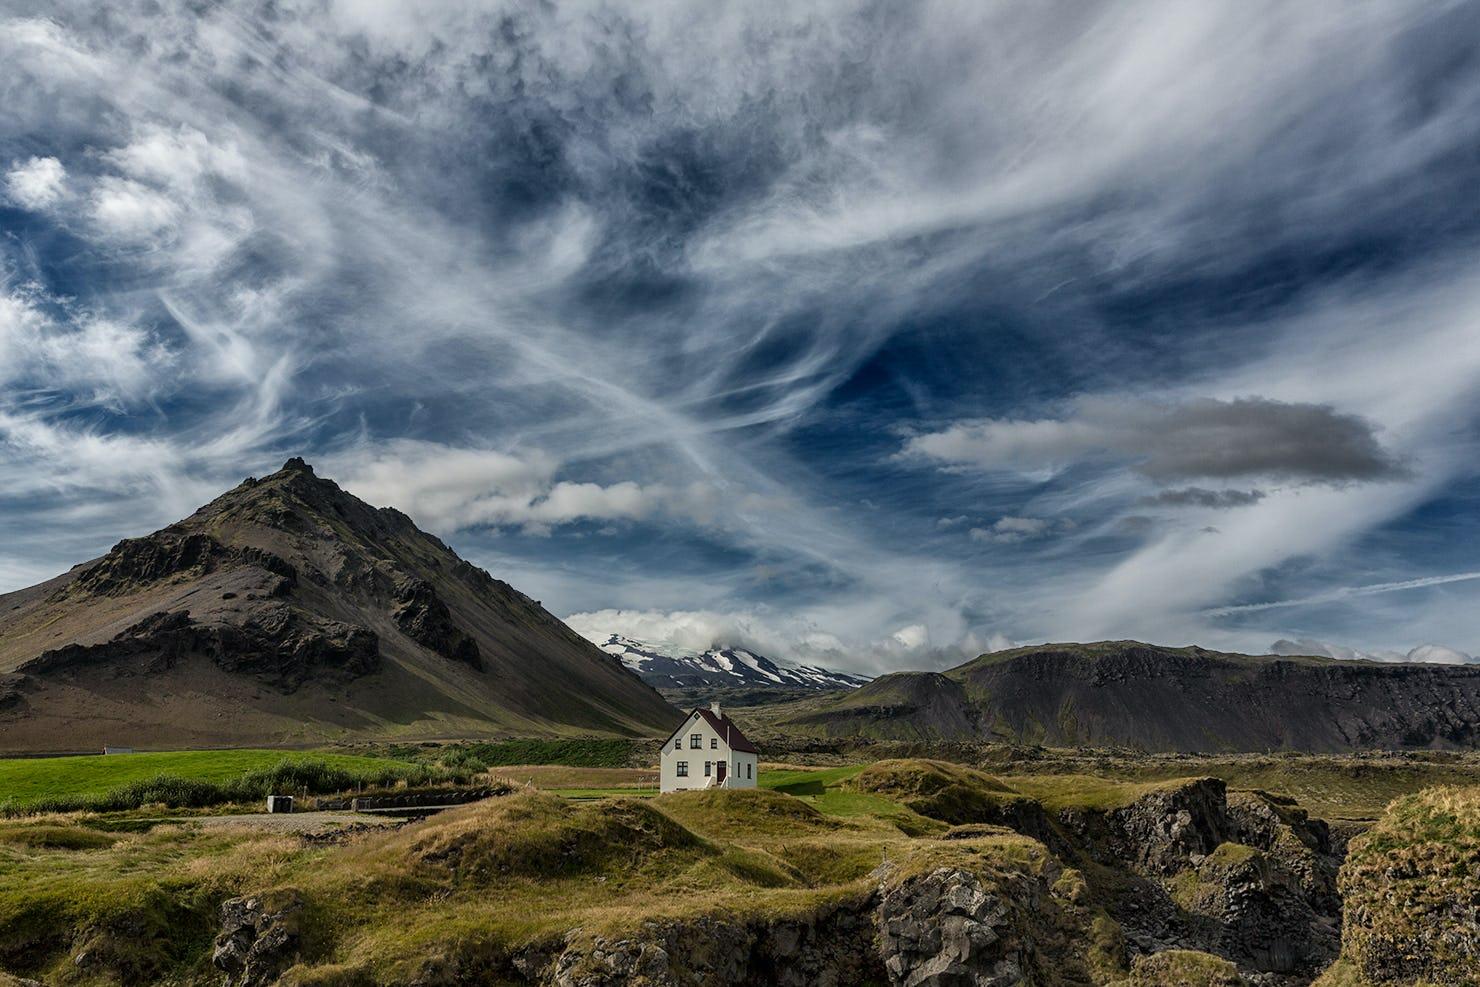 The scenic area of Arnarstapi on the Snæfellsnes Peninsula in West Iceland.